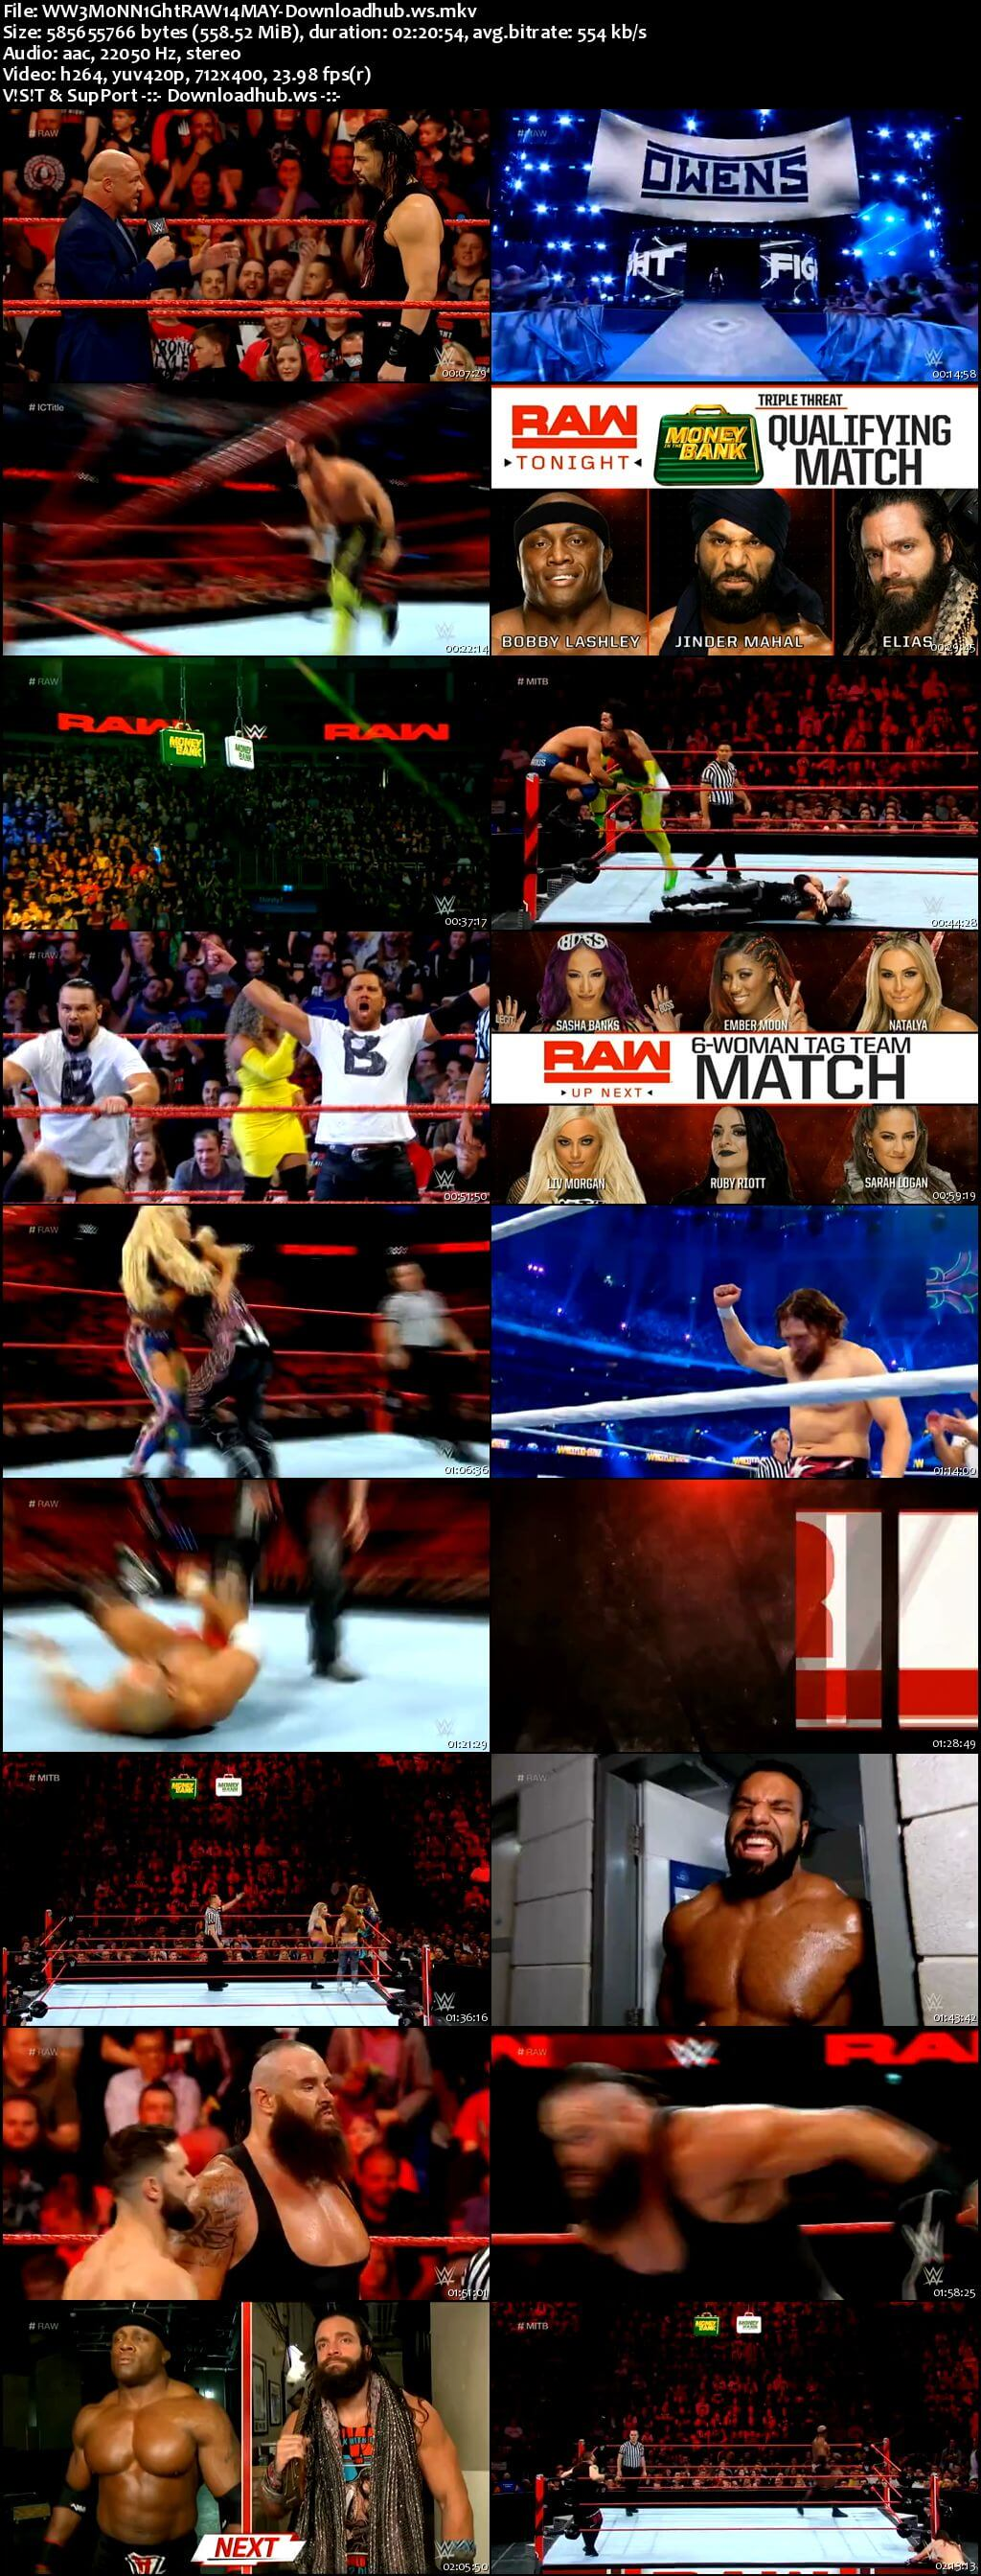 WWE Monday Night Raw 14 May 2018 480p HDTV Download